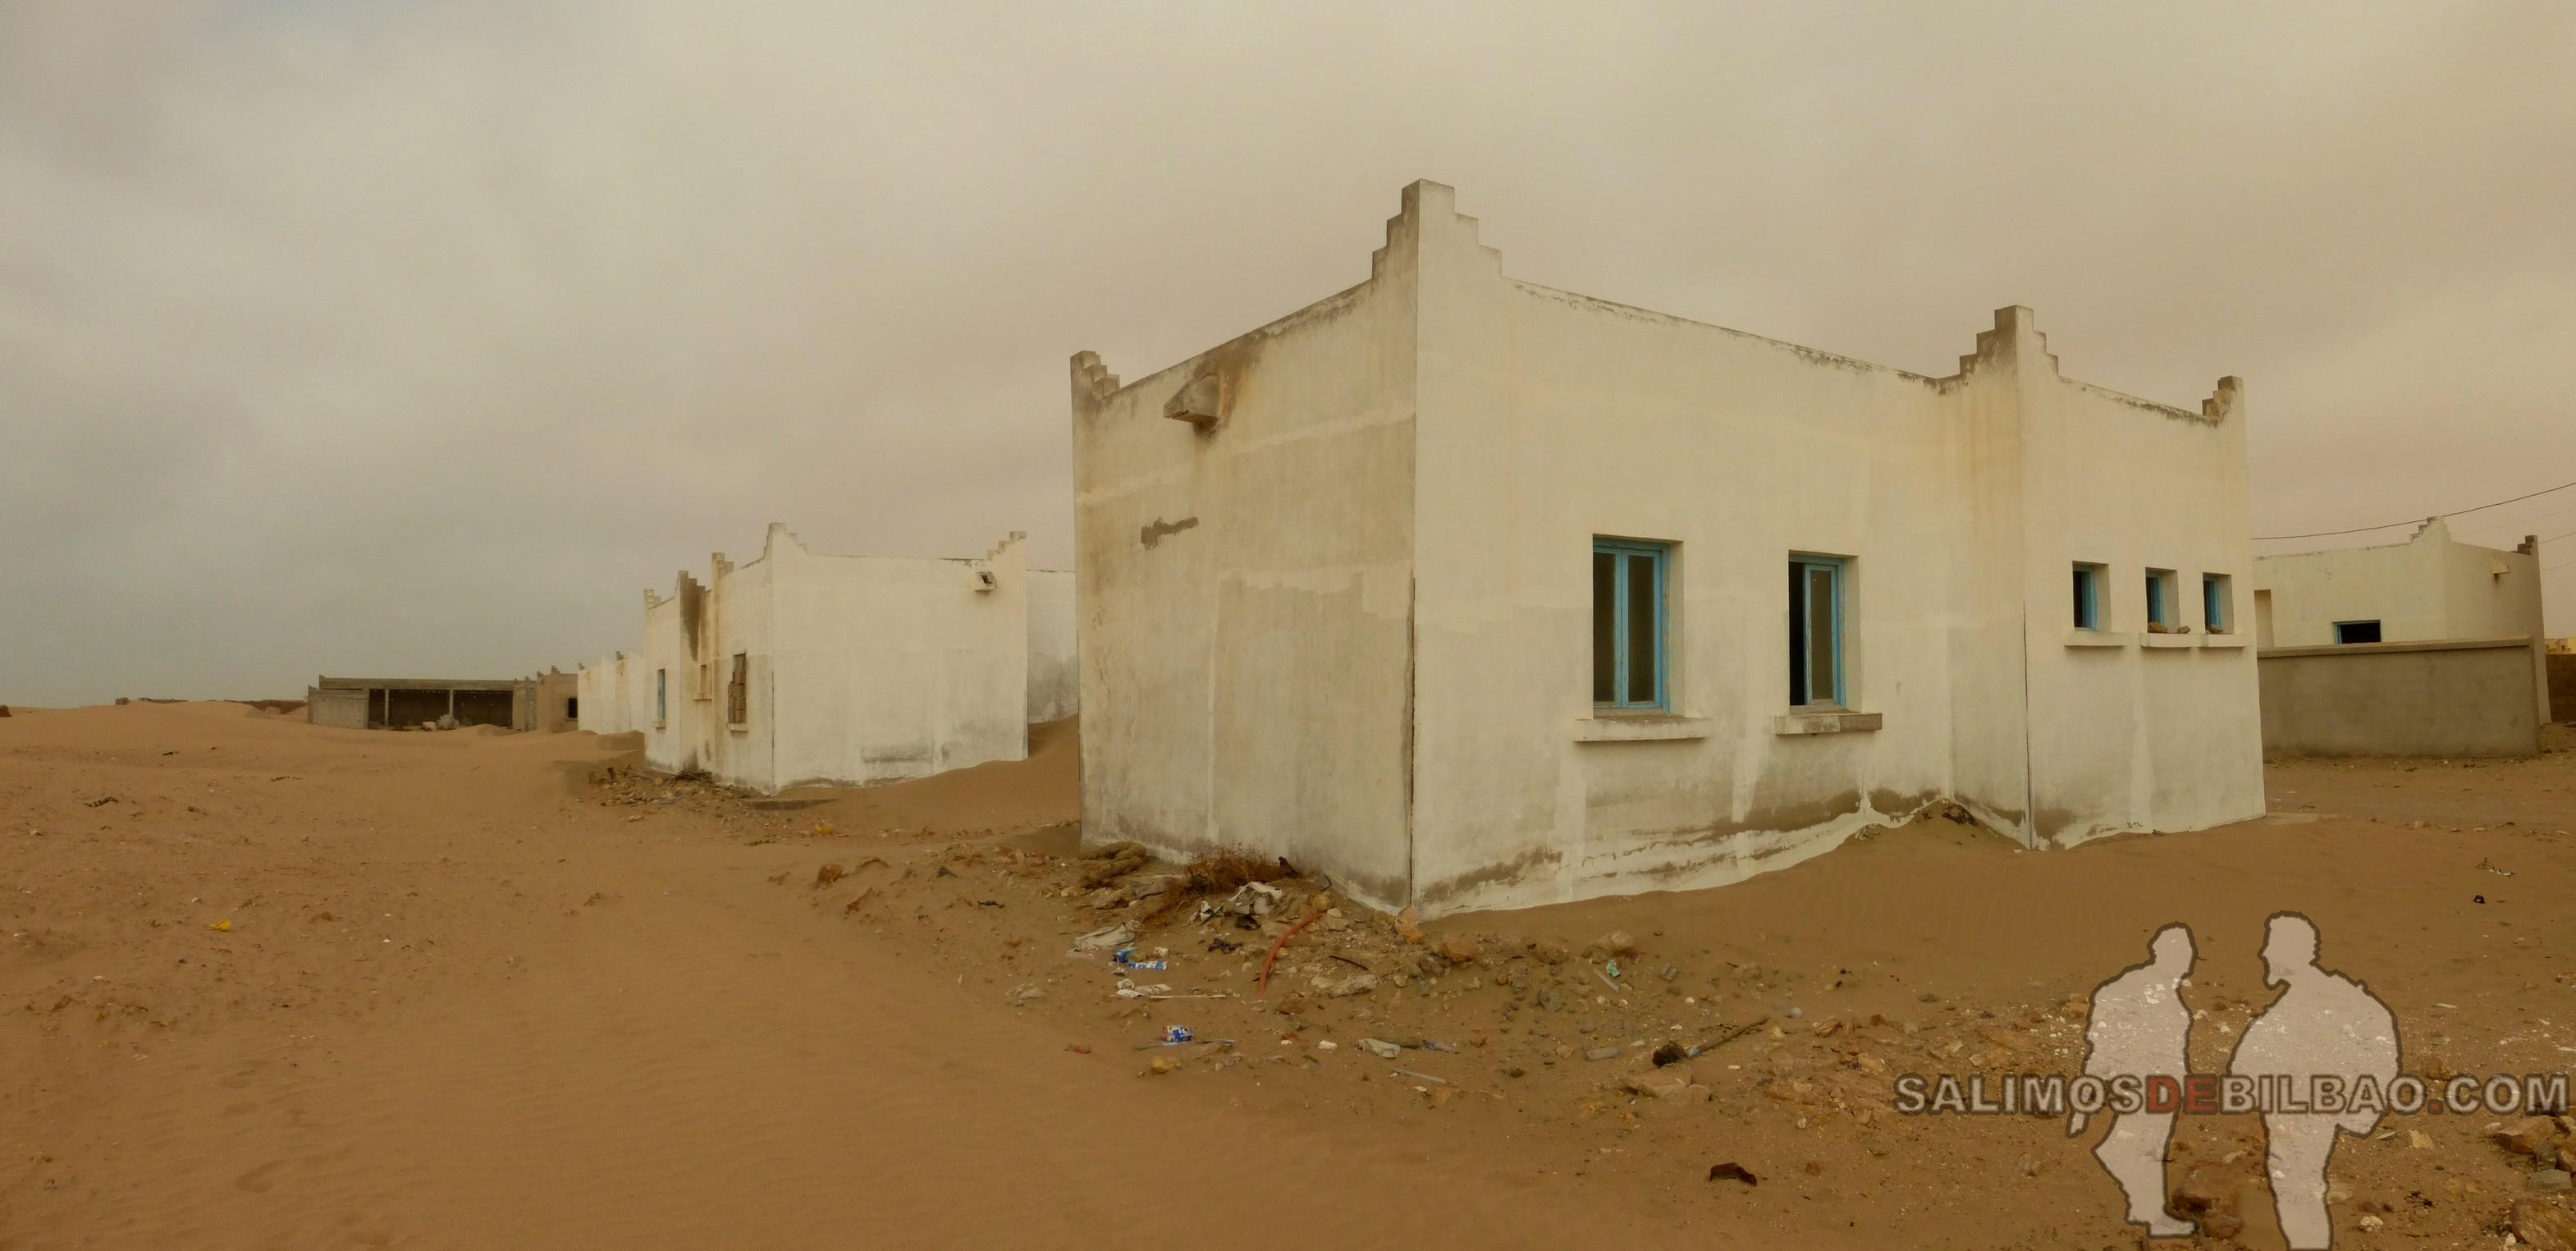 296. Pano, Edificio abandonado junto a la playa, Tarfaya